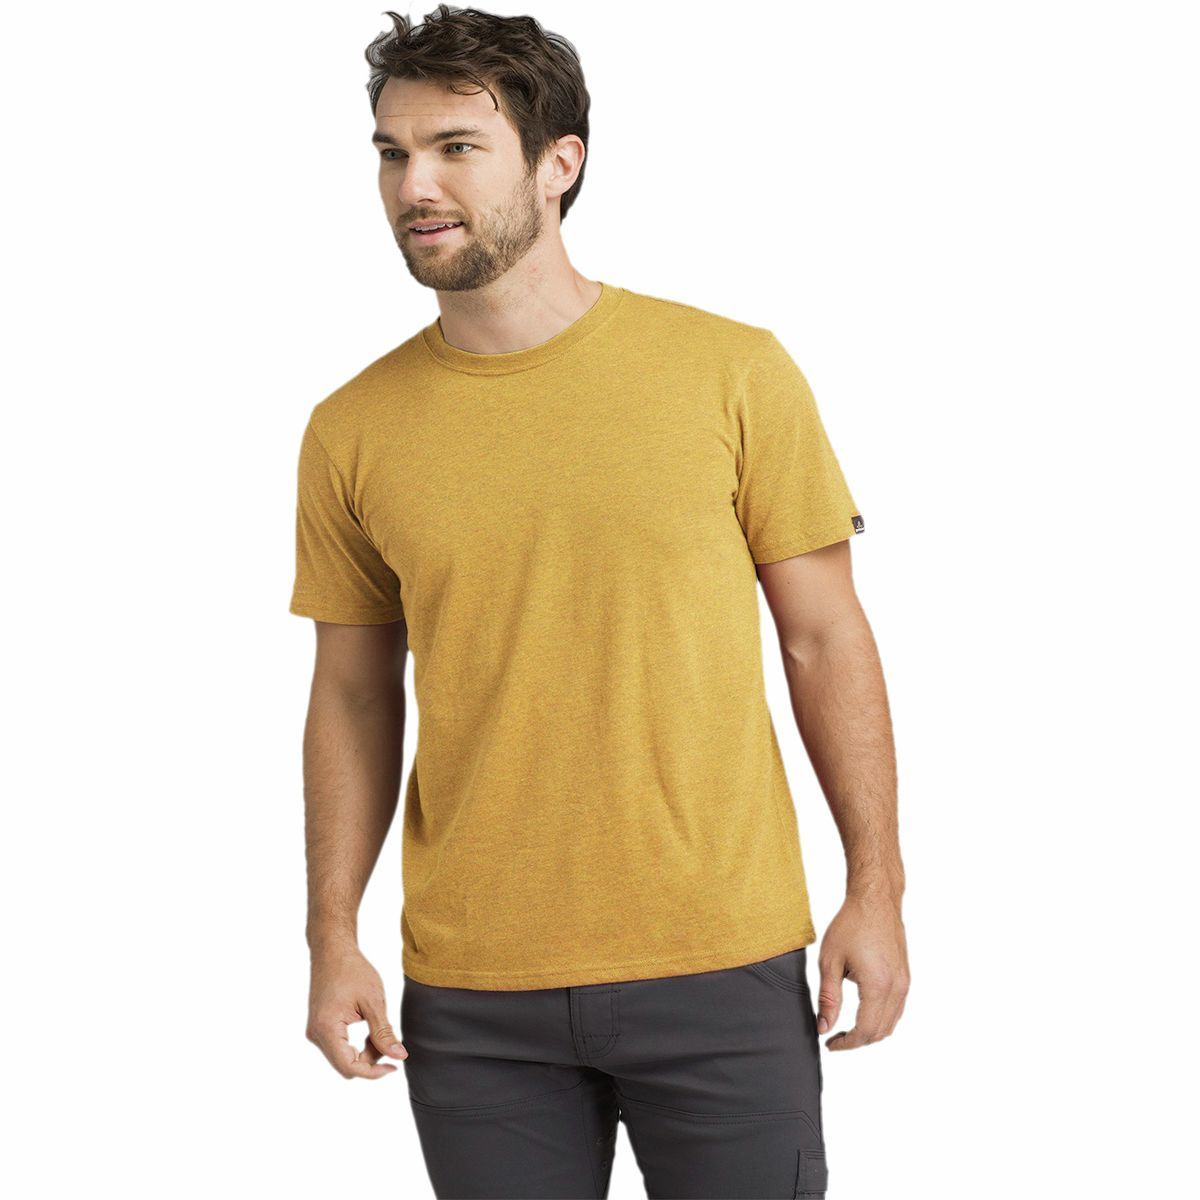 Crew T-Shirt - Men